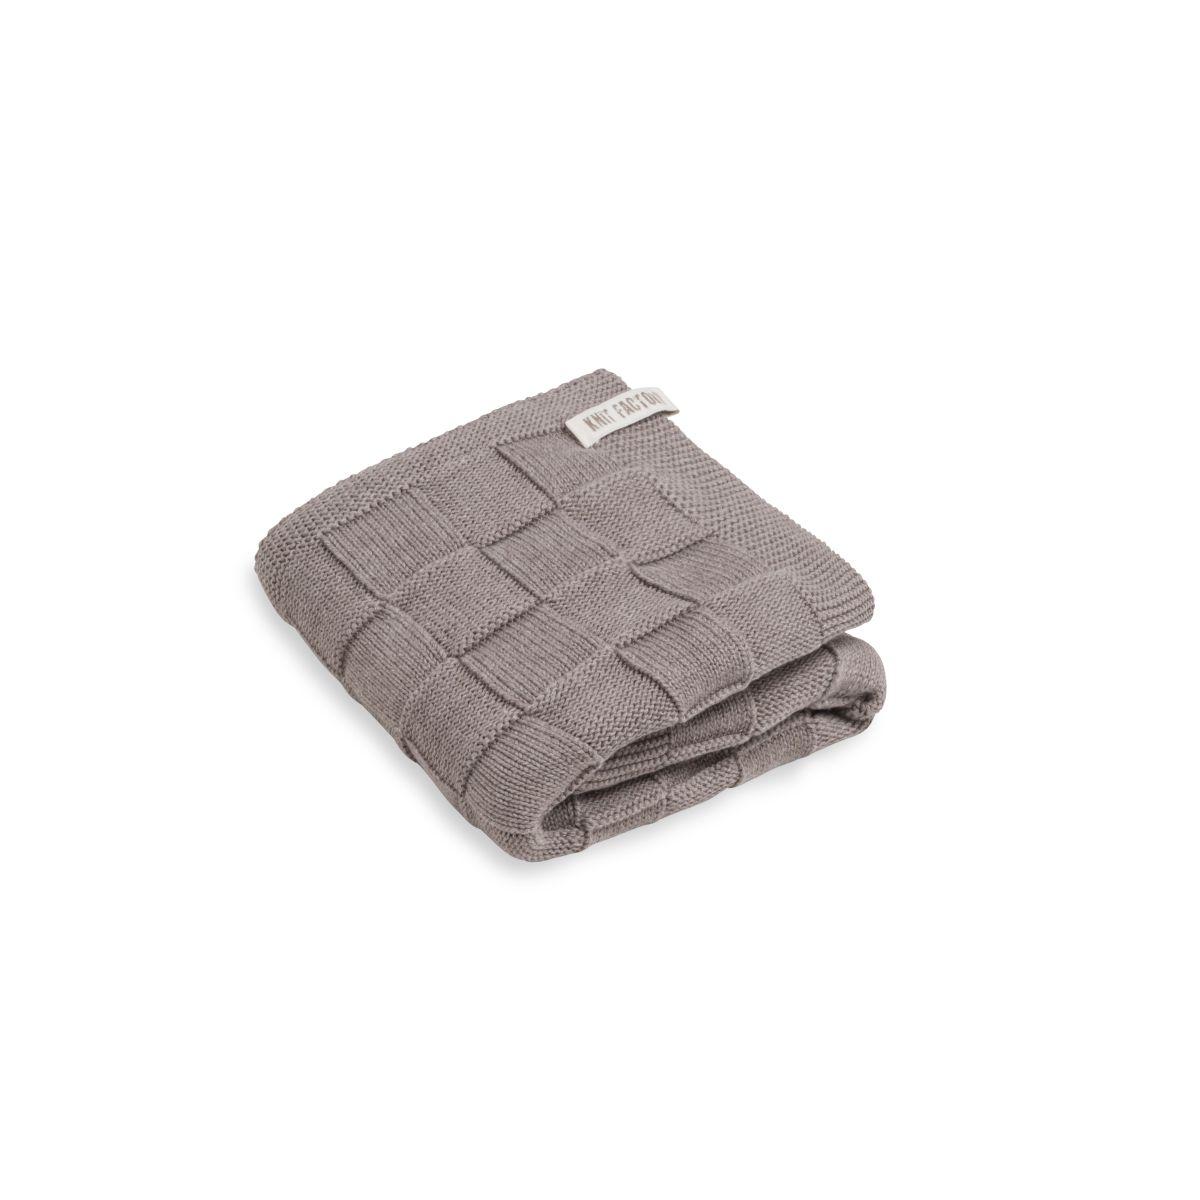 knit factory kf20222502949 handdoek ivy taupe 50x100 1